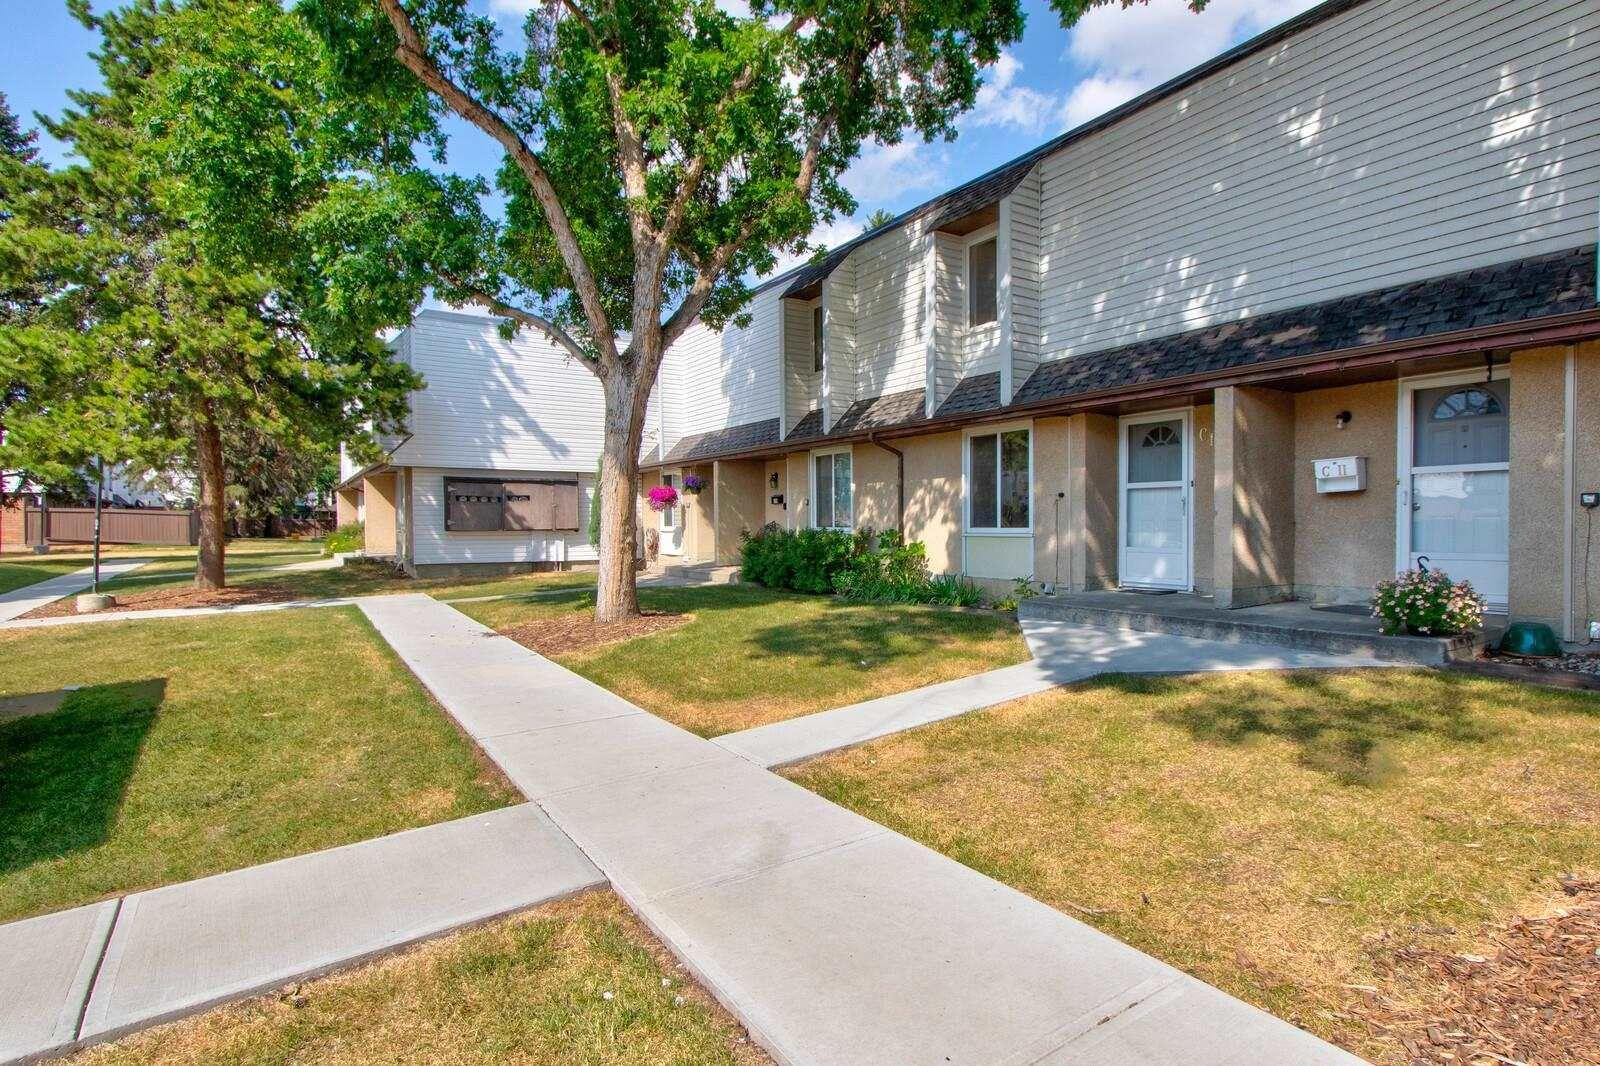 Main Photo: C15 1 GARDEN Grove in Edmonton: Zone 16 Townhouse for sale : MLS®# E4256836